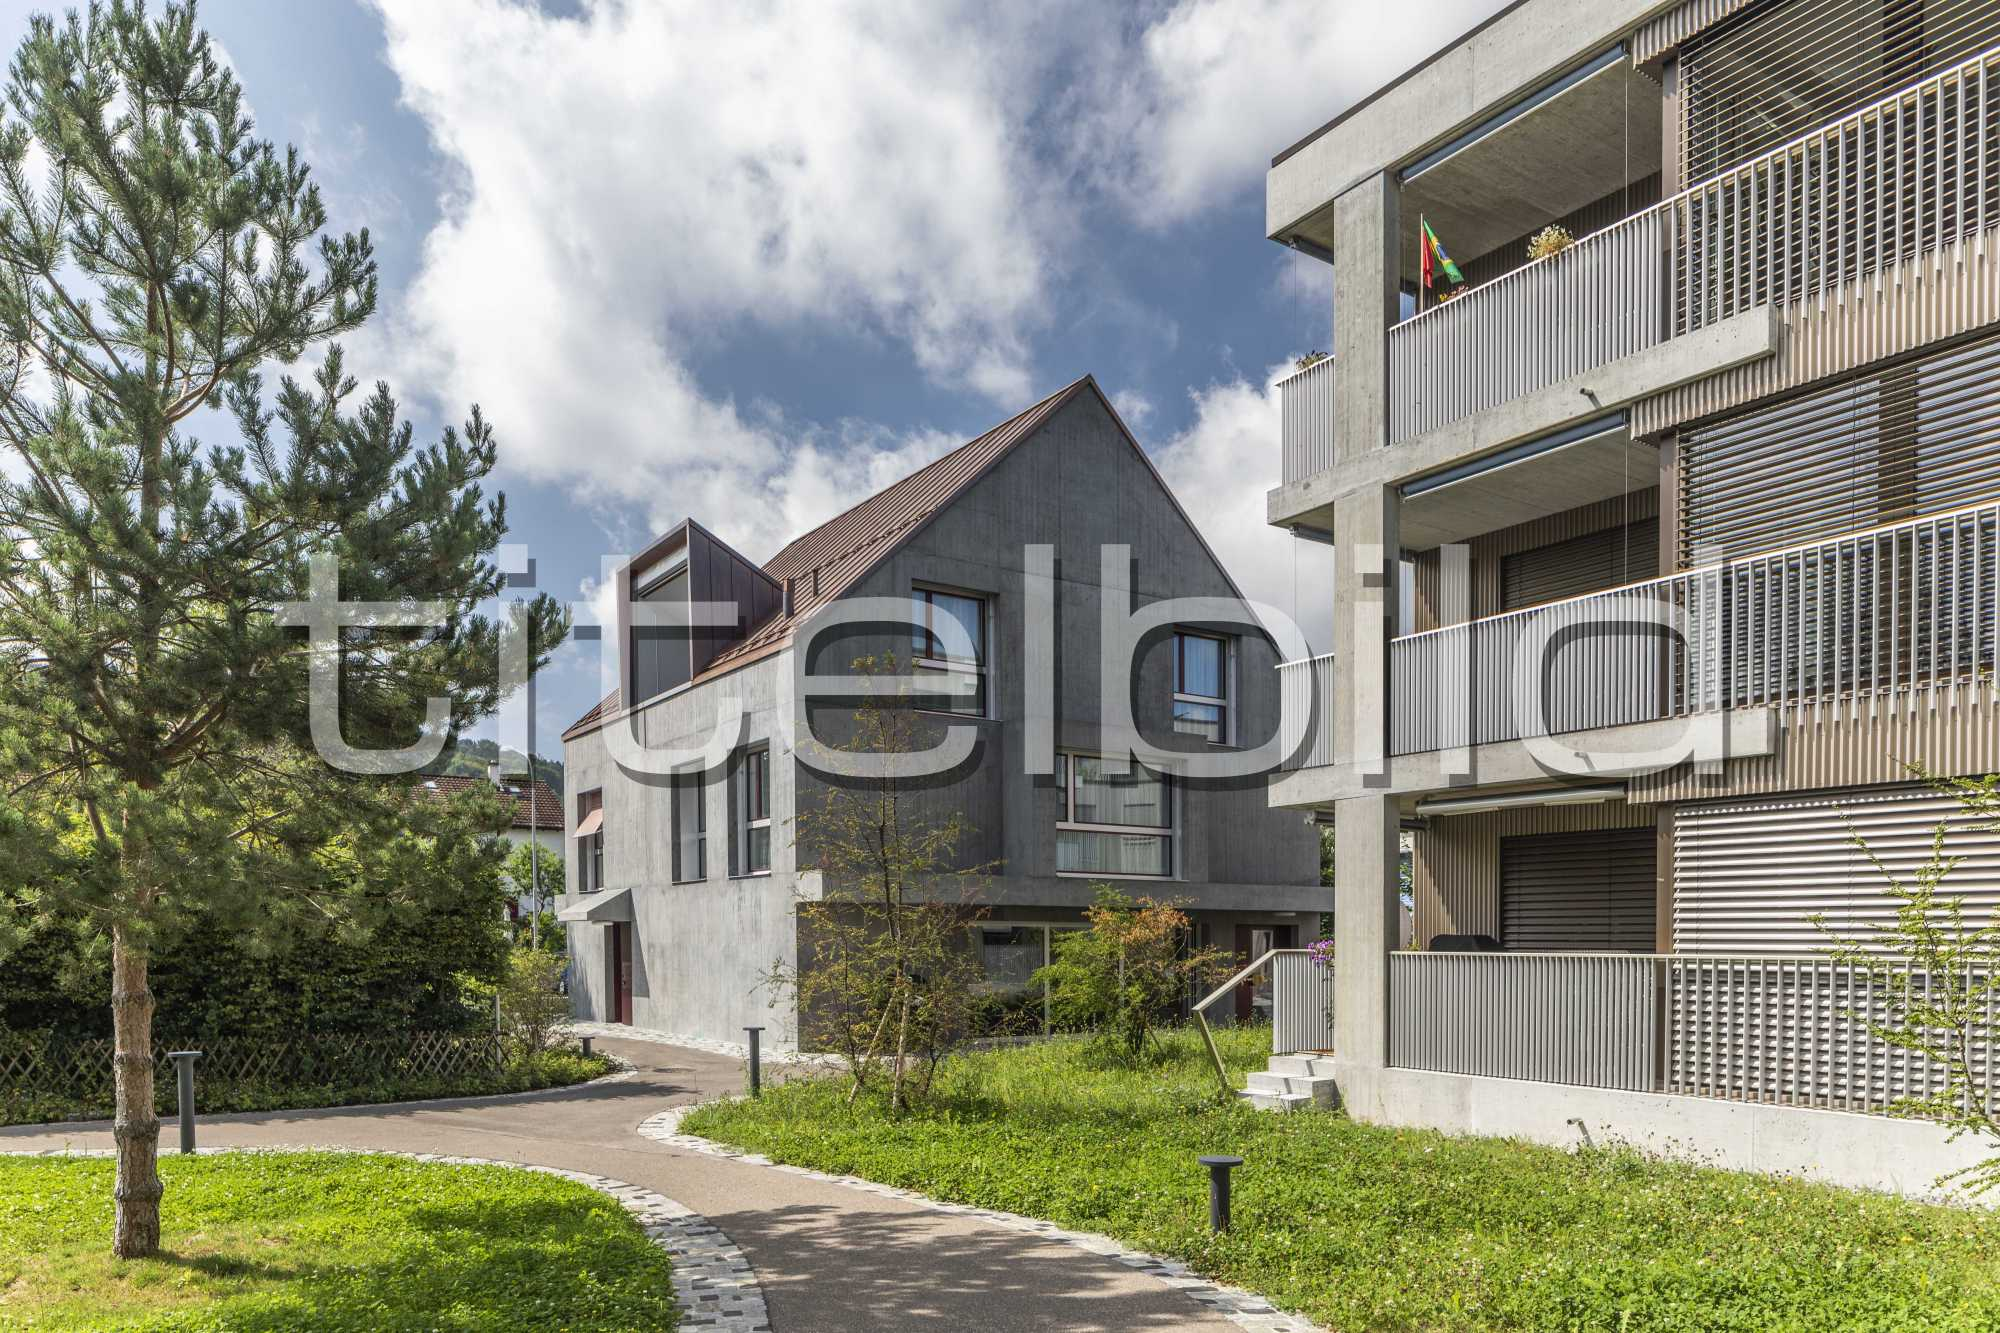 Projektbild-Nr. 1: Neubau Siedlung Riedgraben (Siedlungslokal)